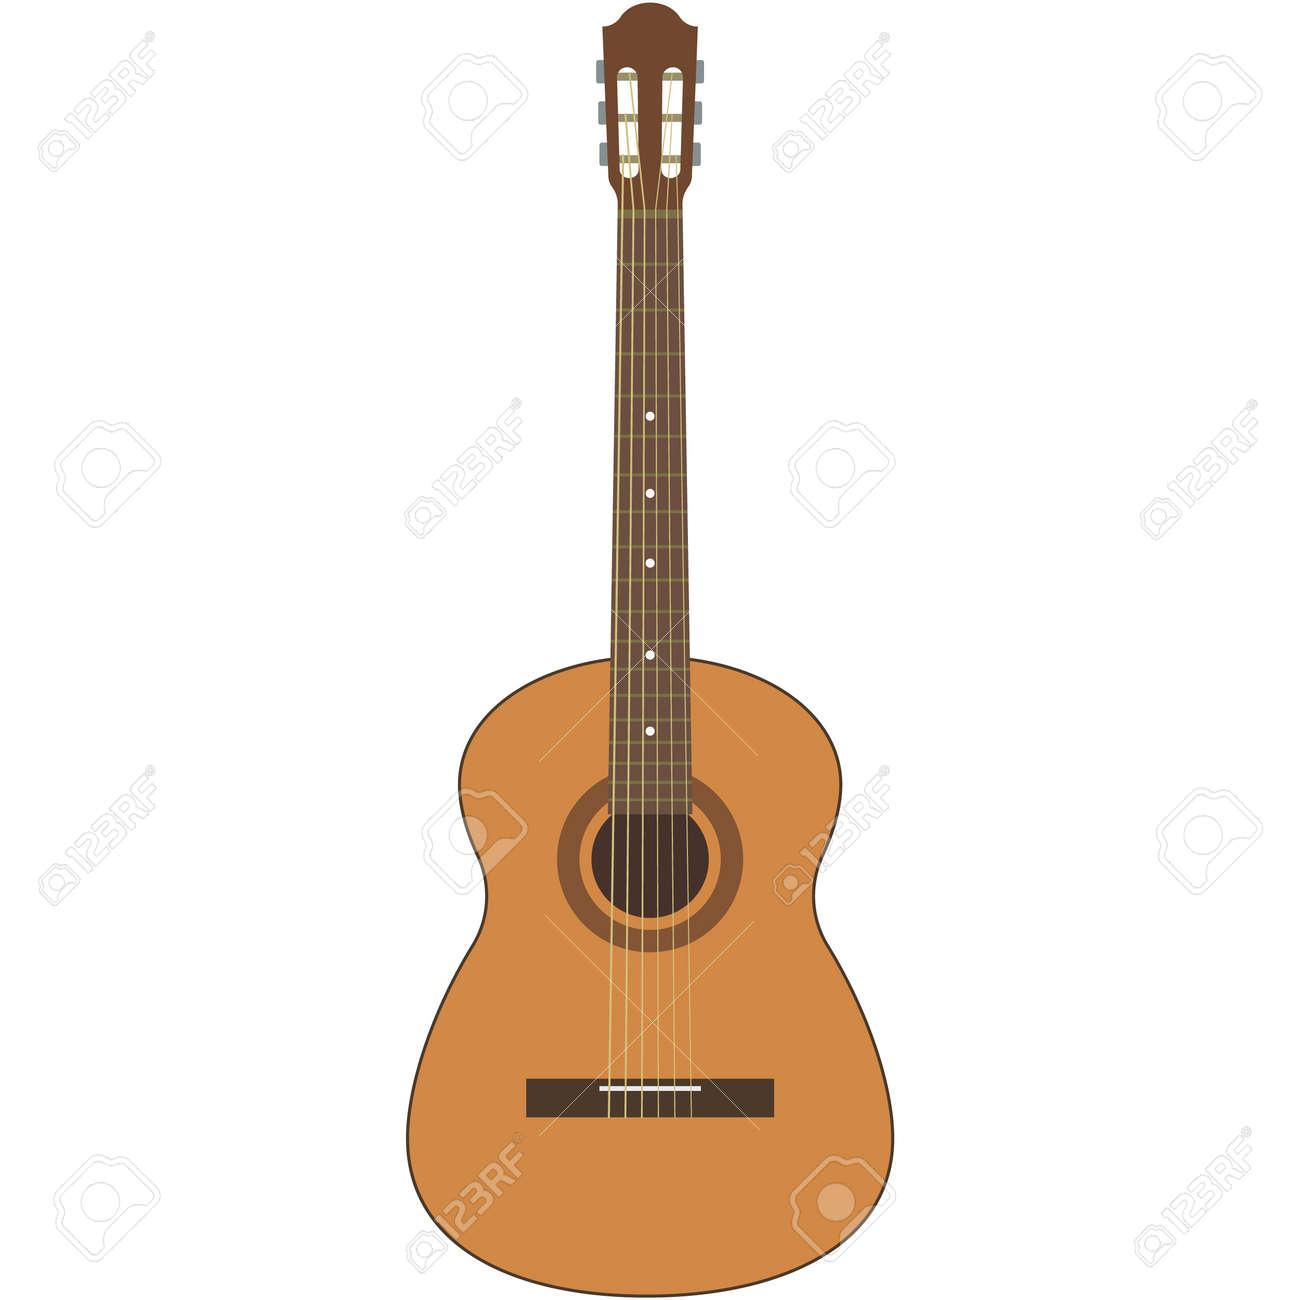 Vector guitar illustration acoustic music instrument on white - 168274264